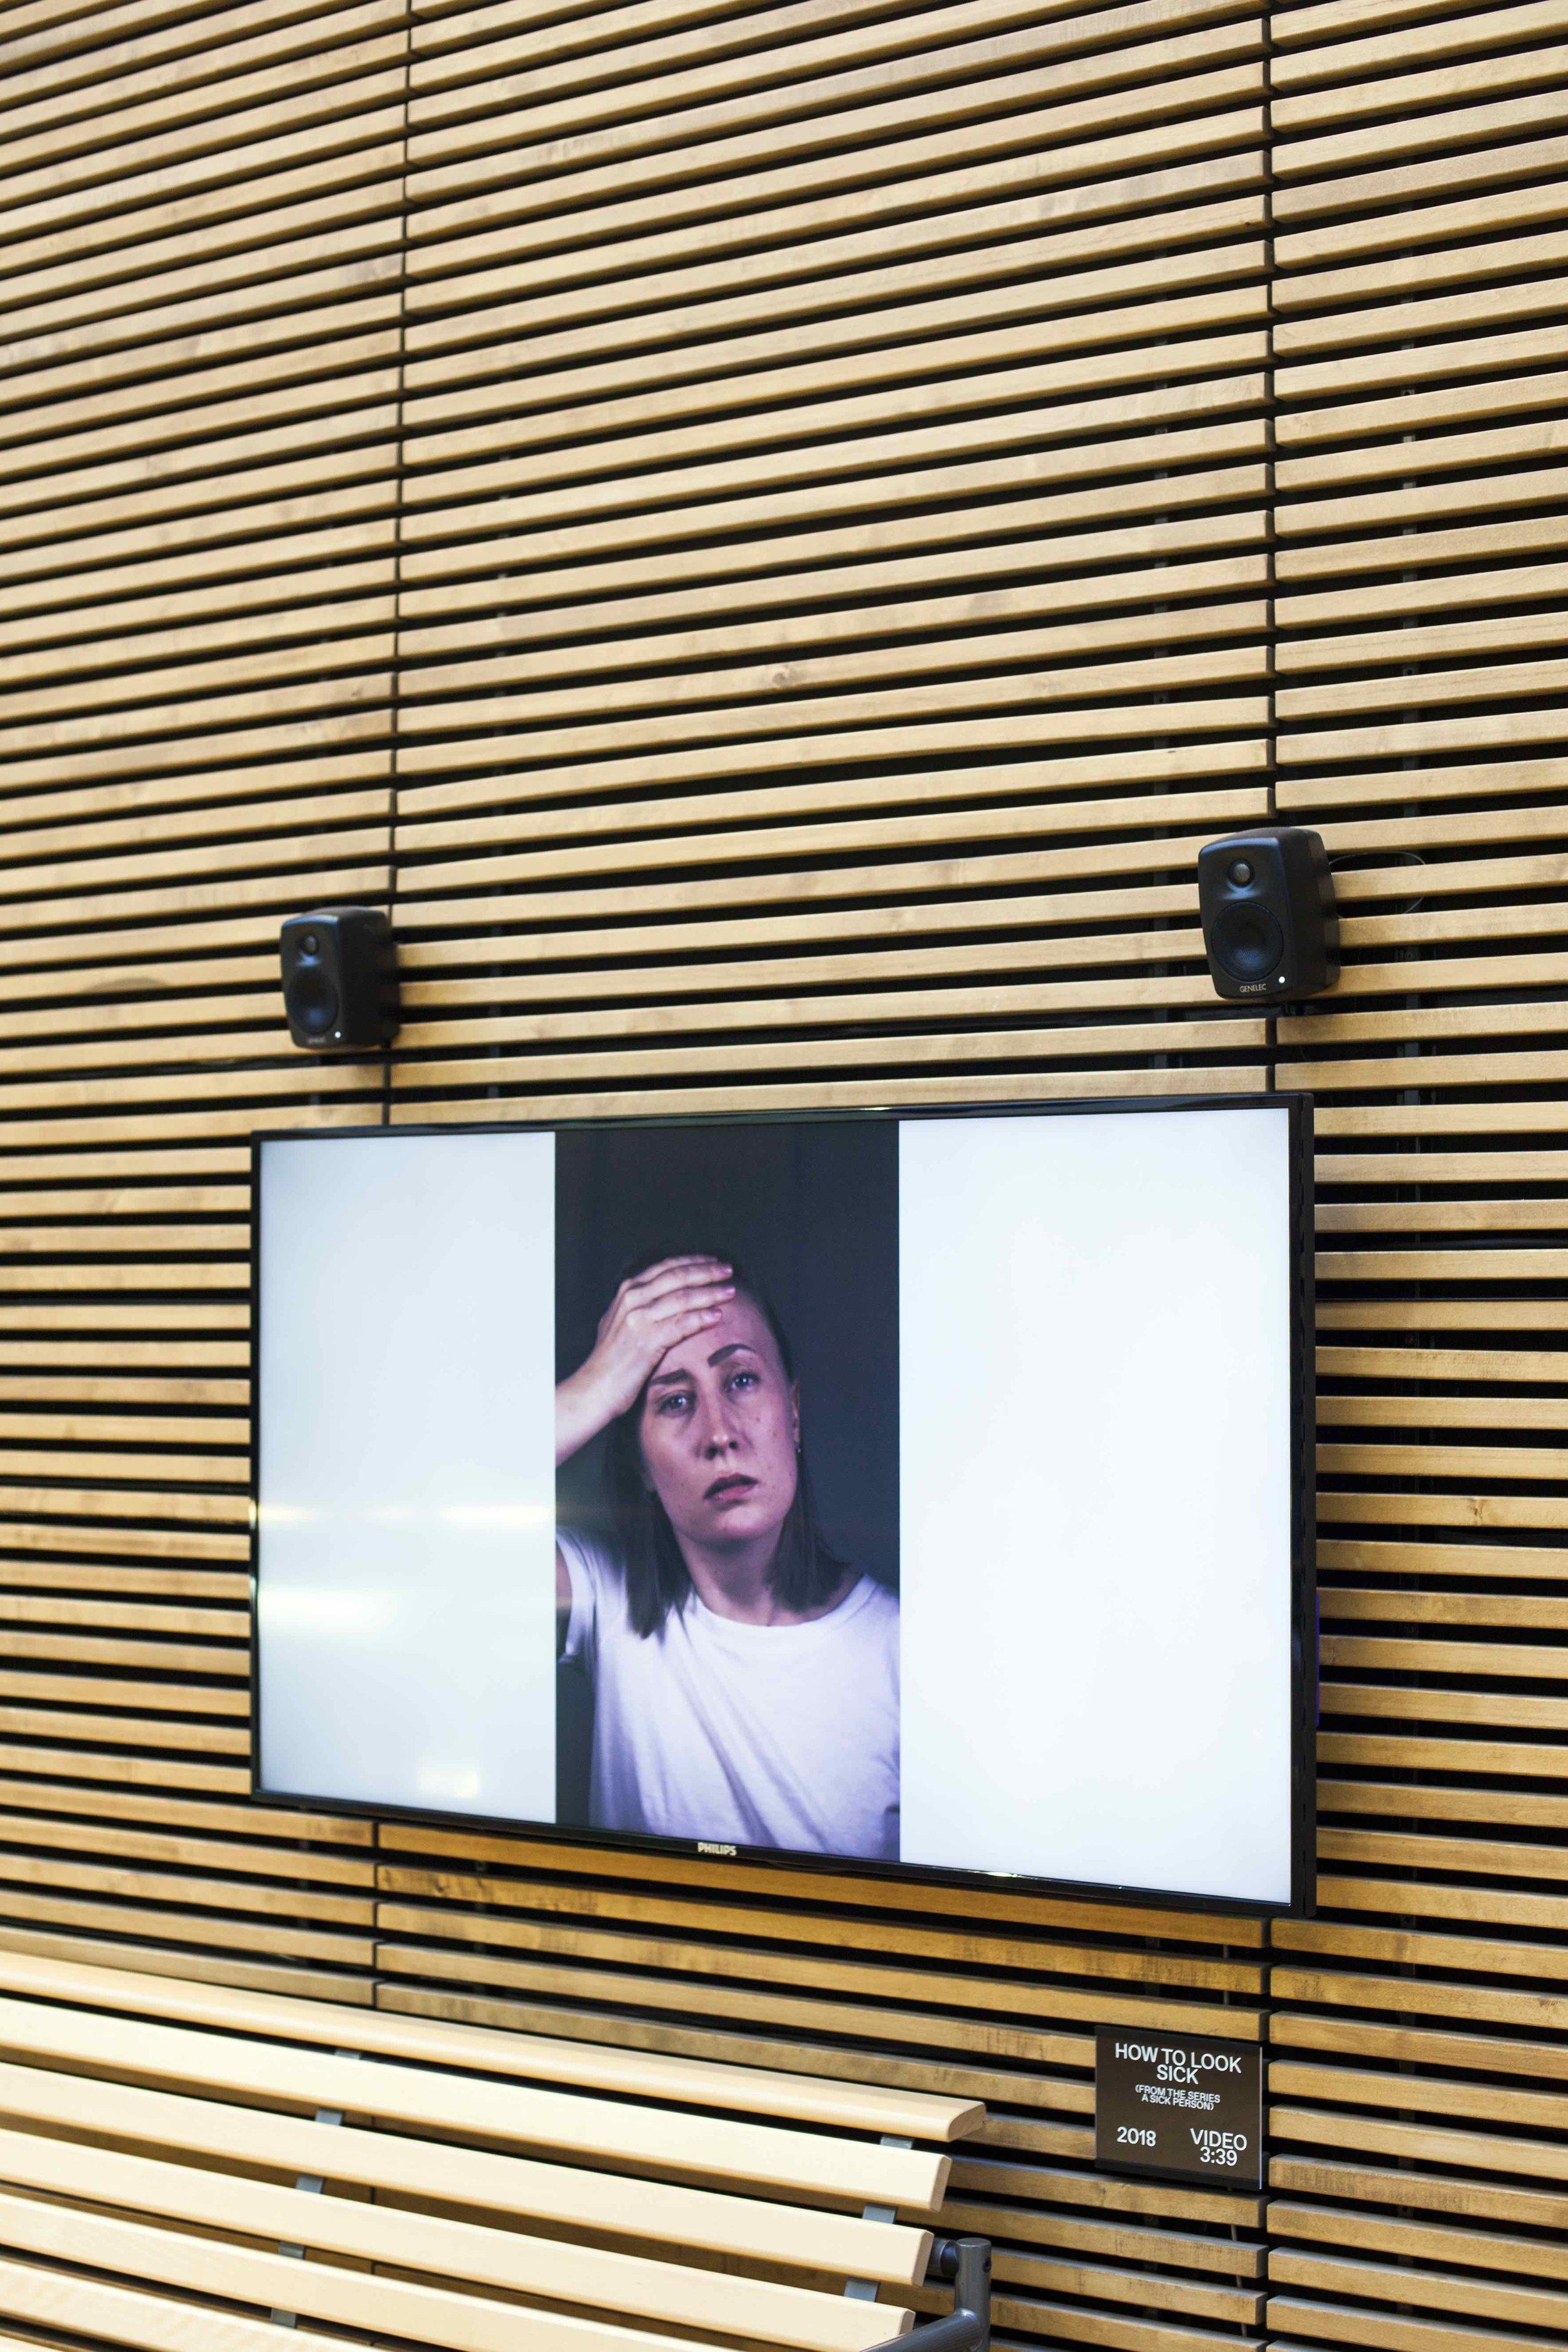 Photo: Jenni Holma / Aalto University